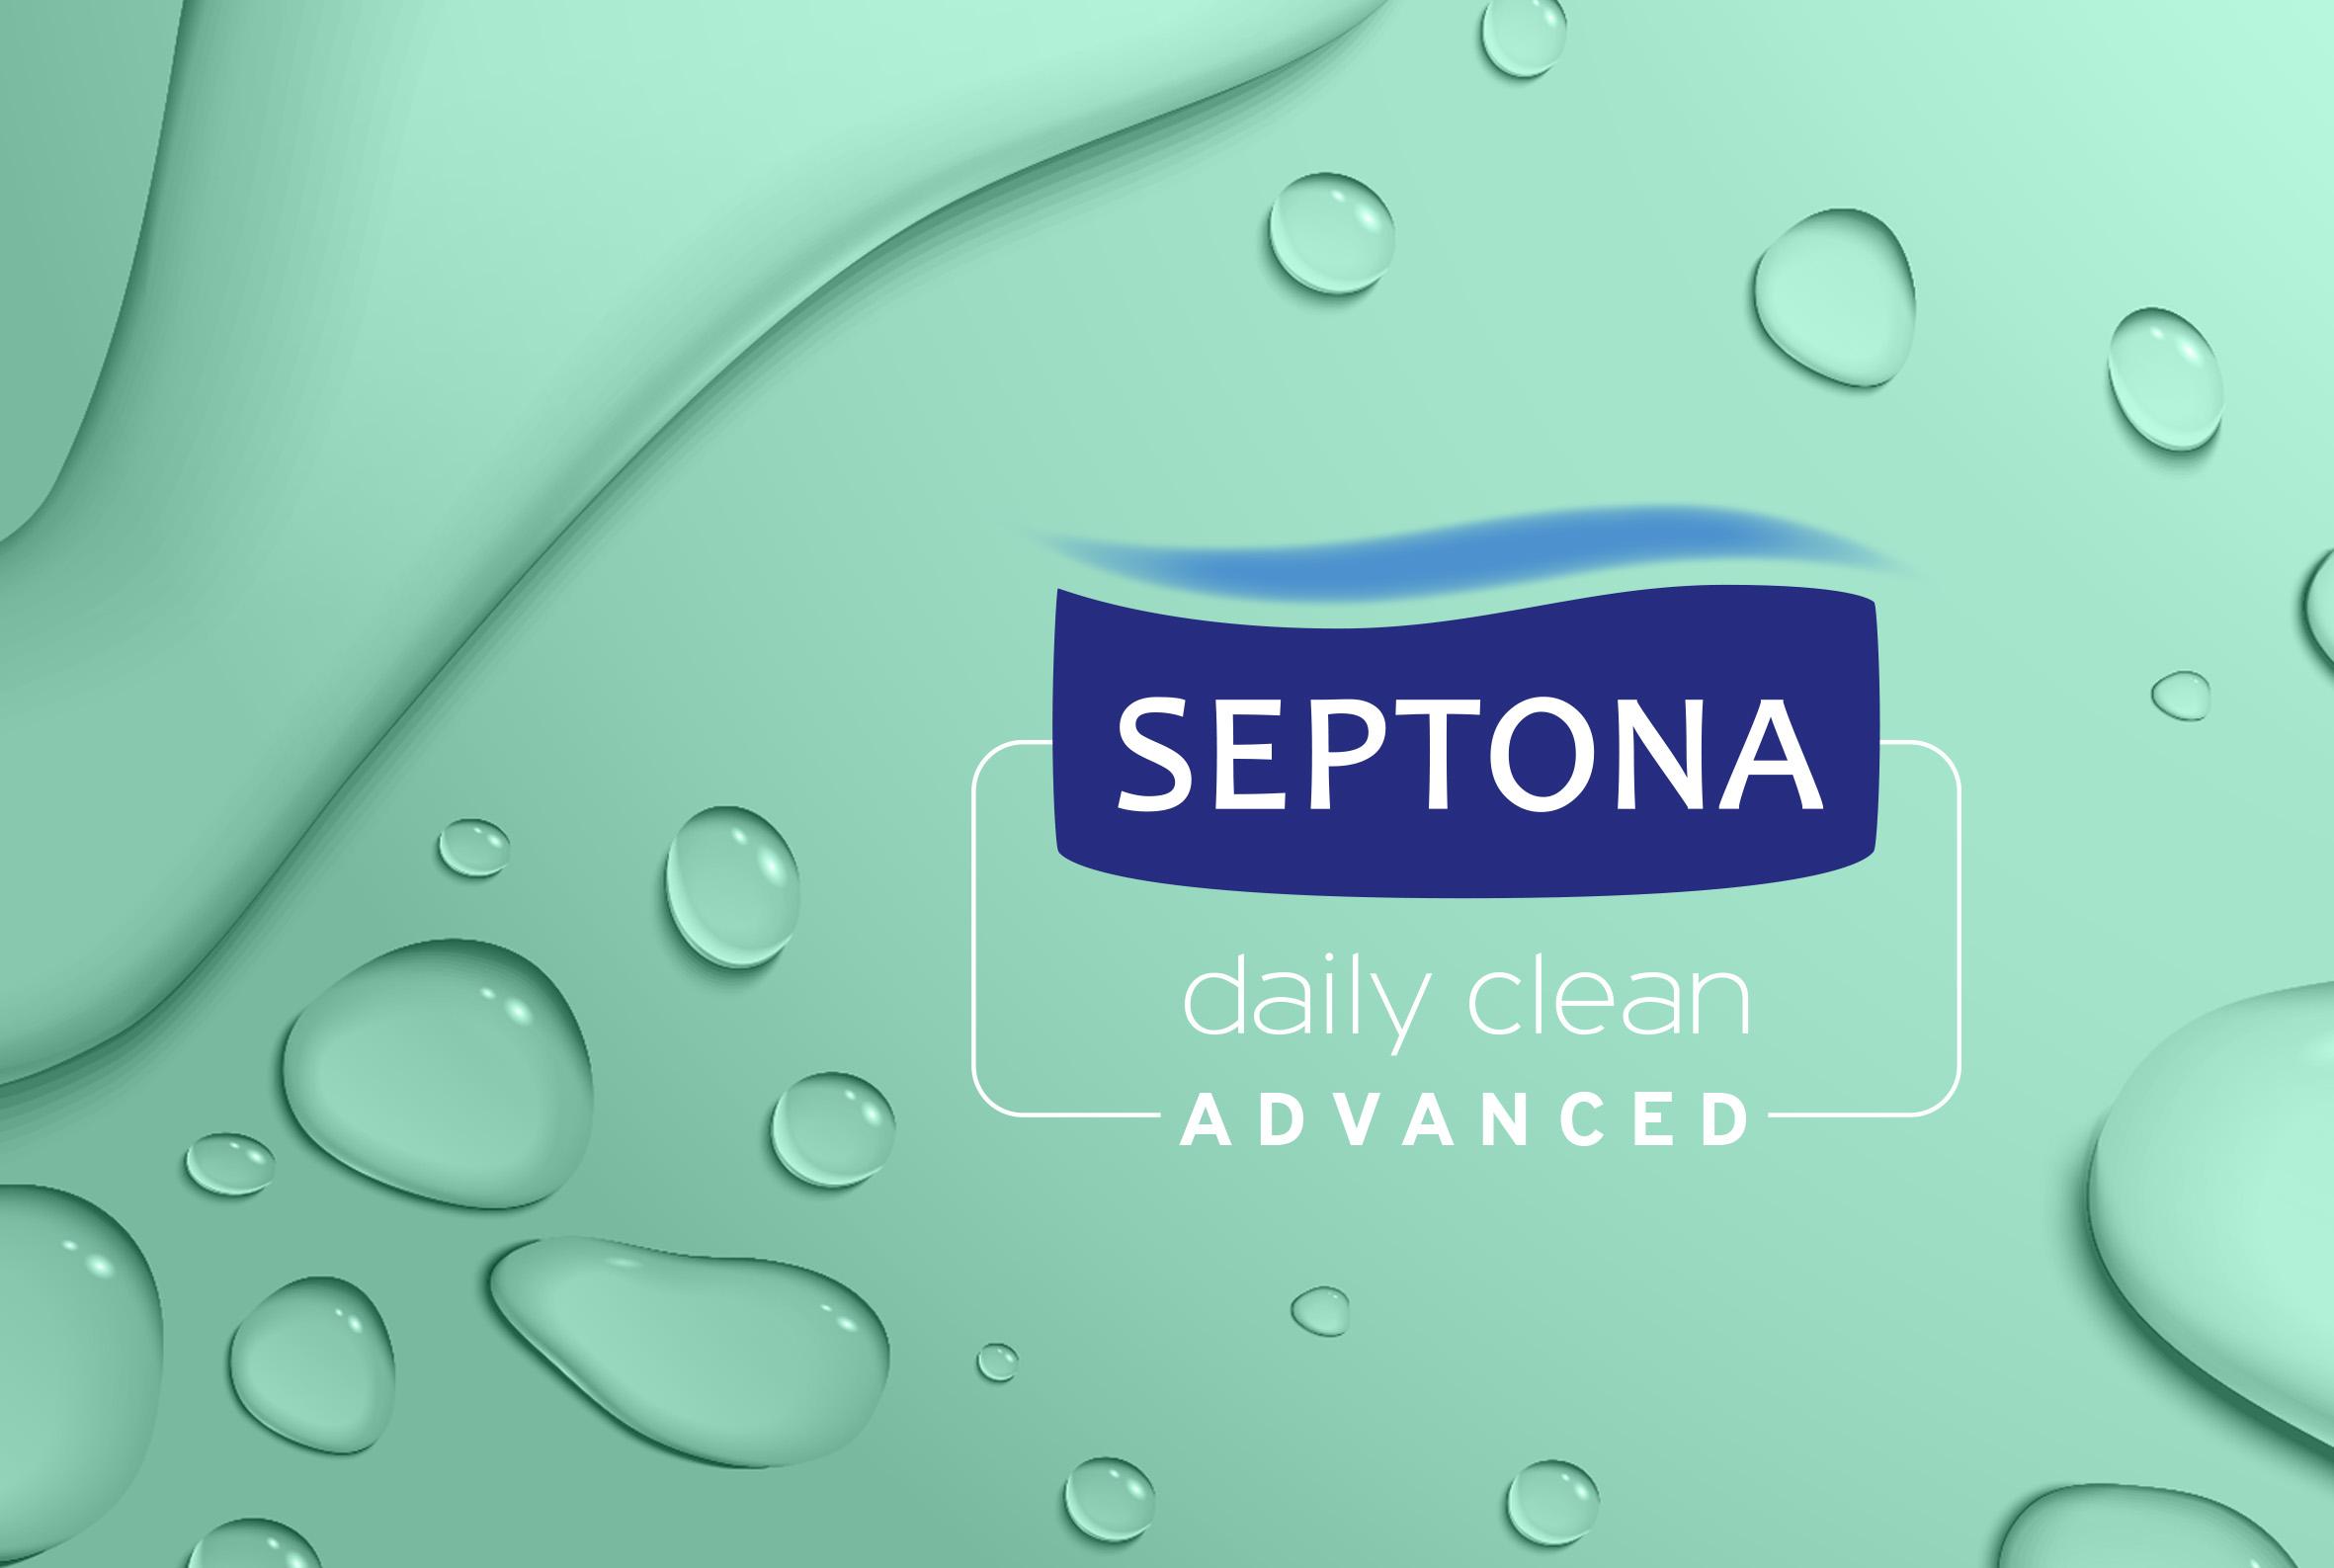 SEPTONA_DAILY CLEAN